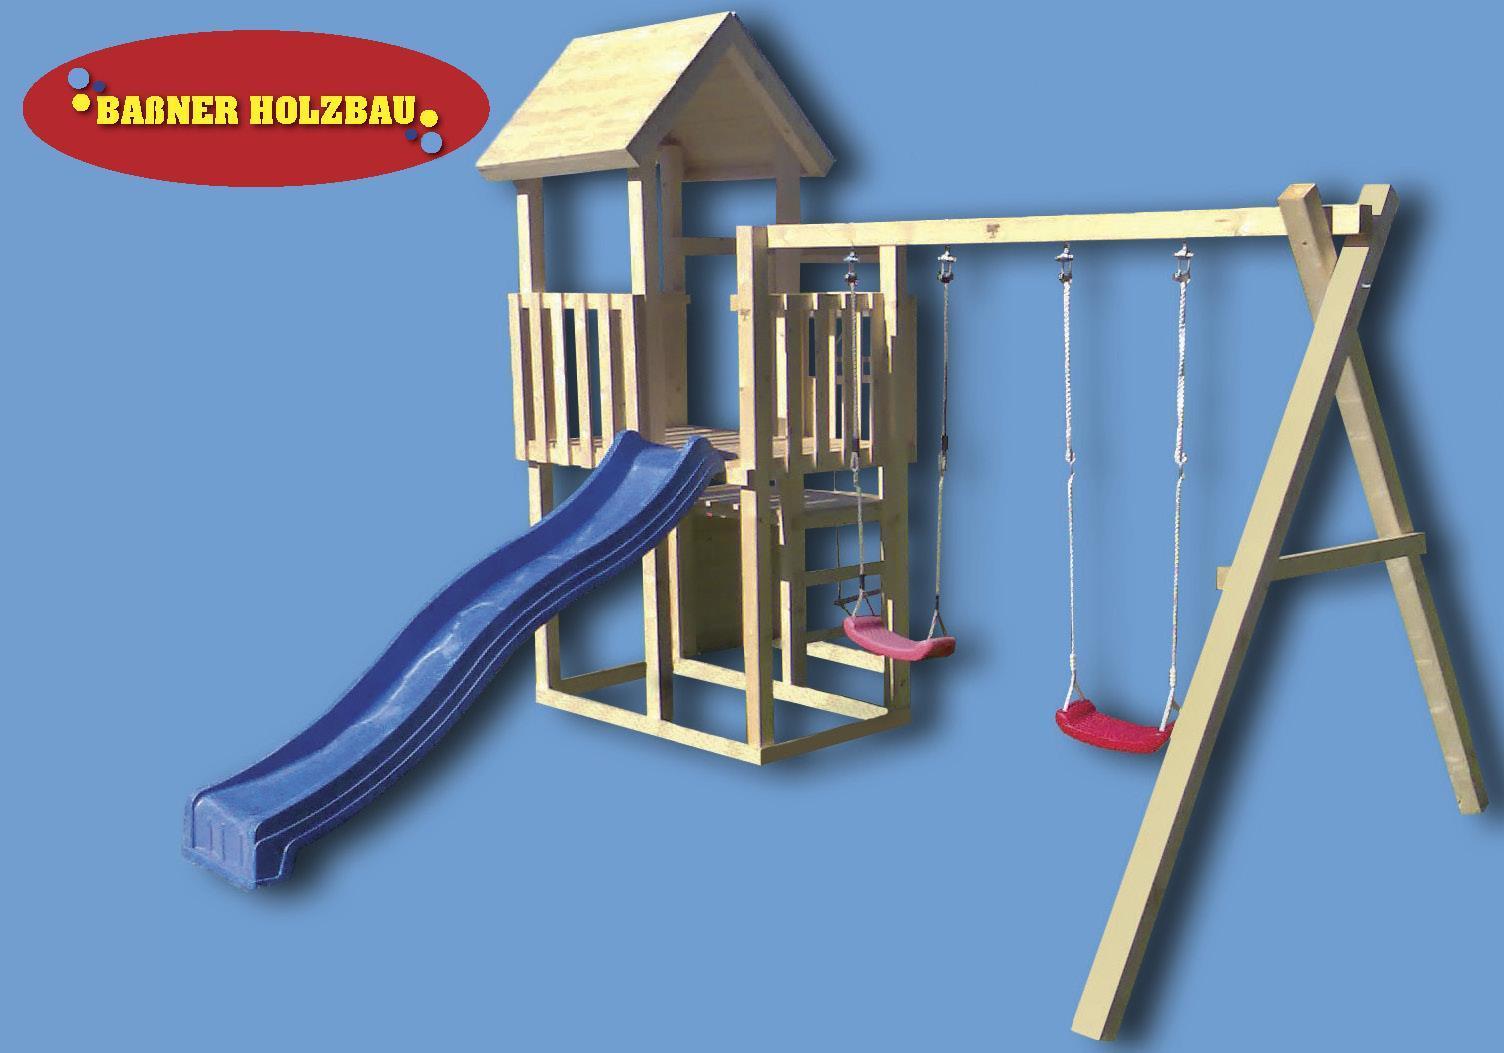 fichtenholz spielturm modell 8 conny ohne zubeh r ohne rutsche ohne rutsche ohne zubeh r. Black Bedroom Furniture Sets. Home Design Ideas